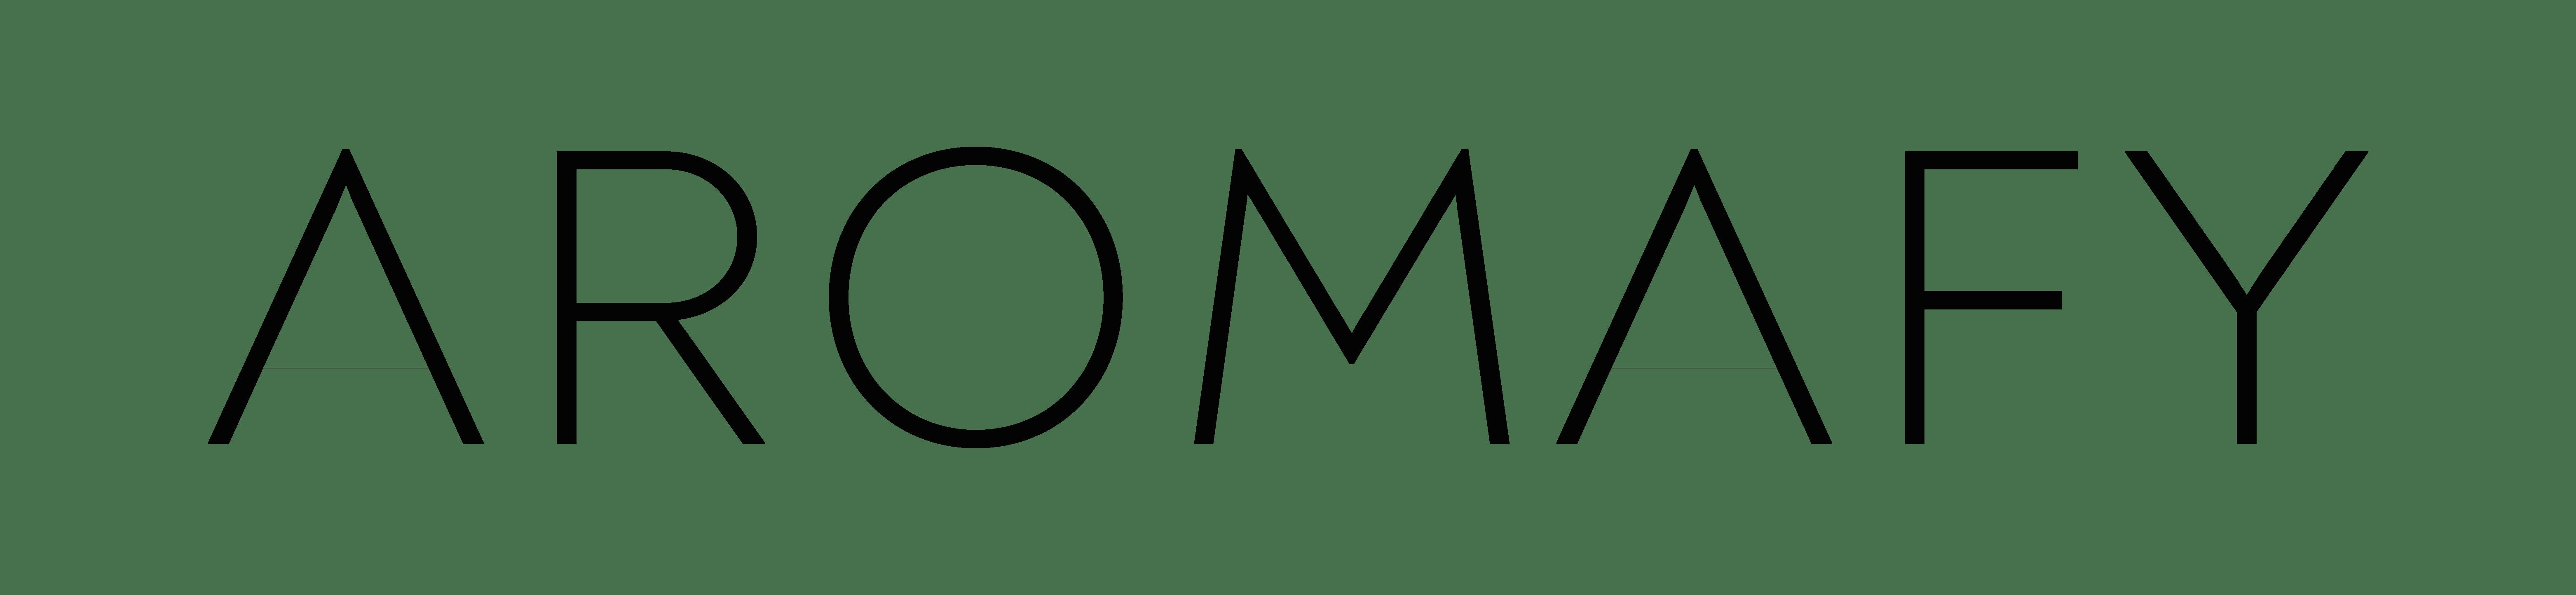 Aromafy